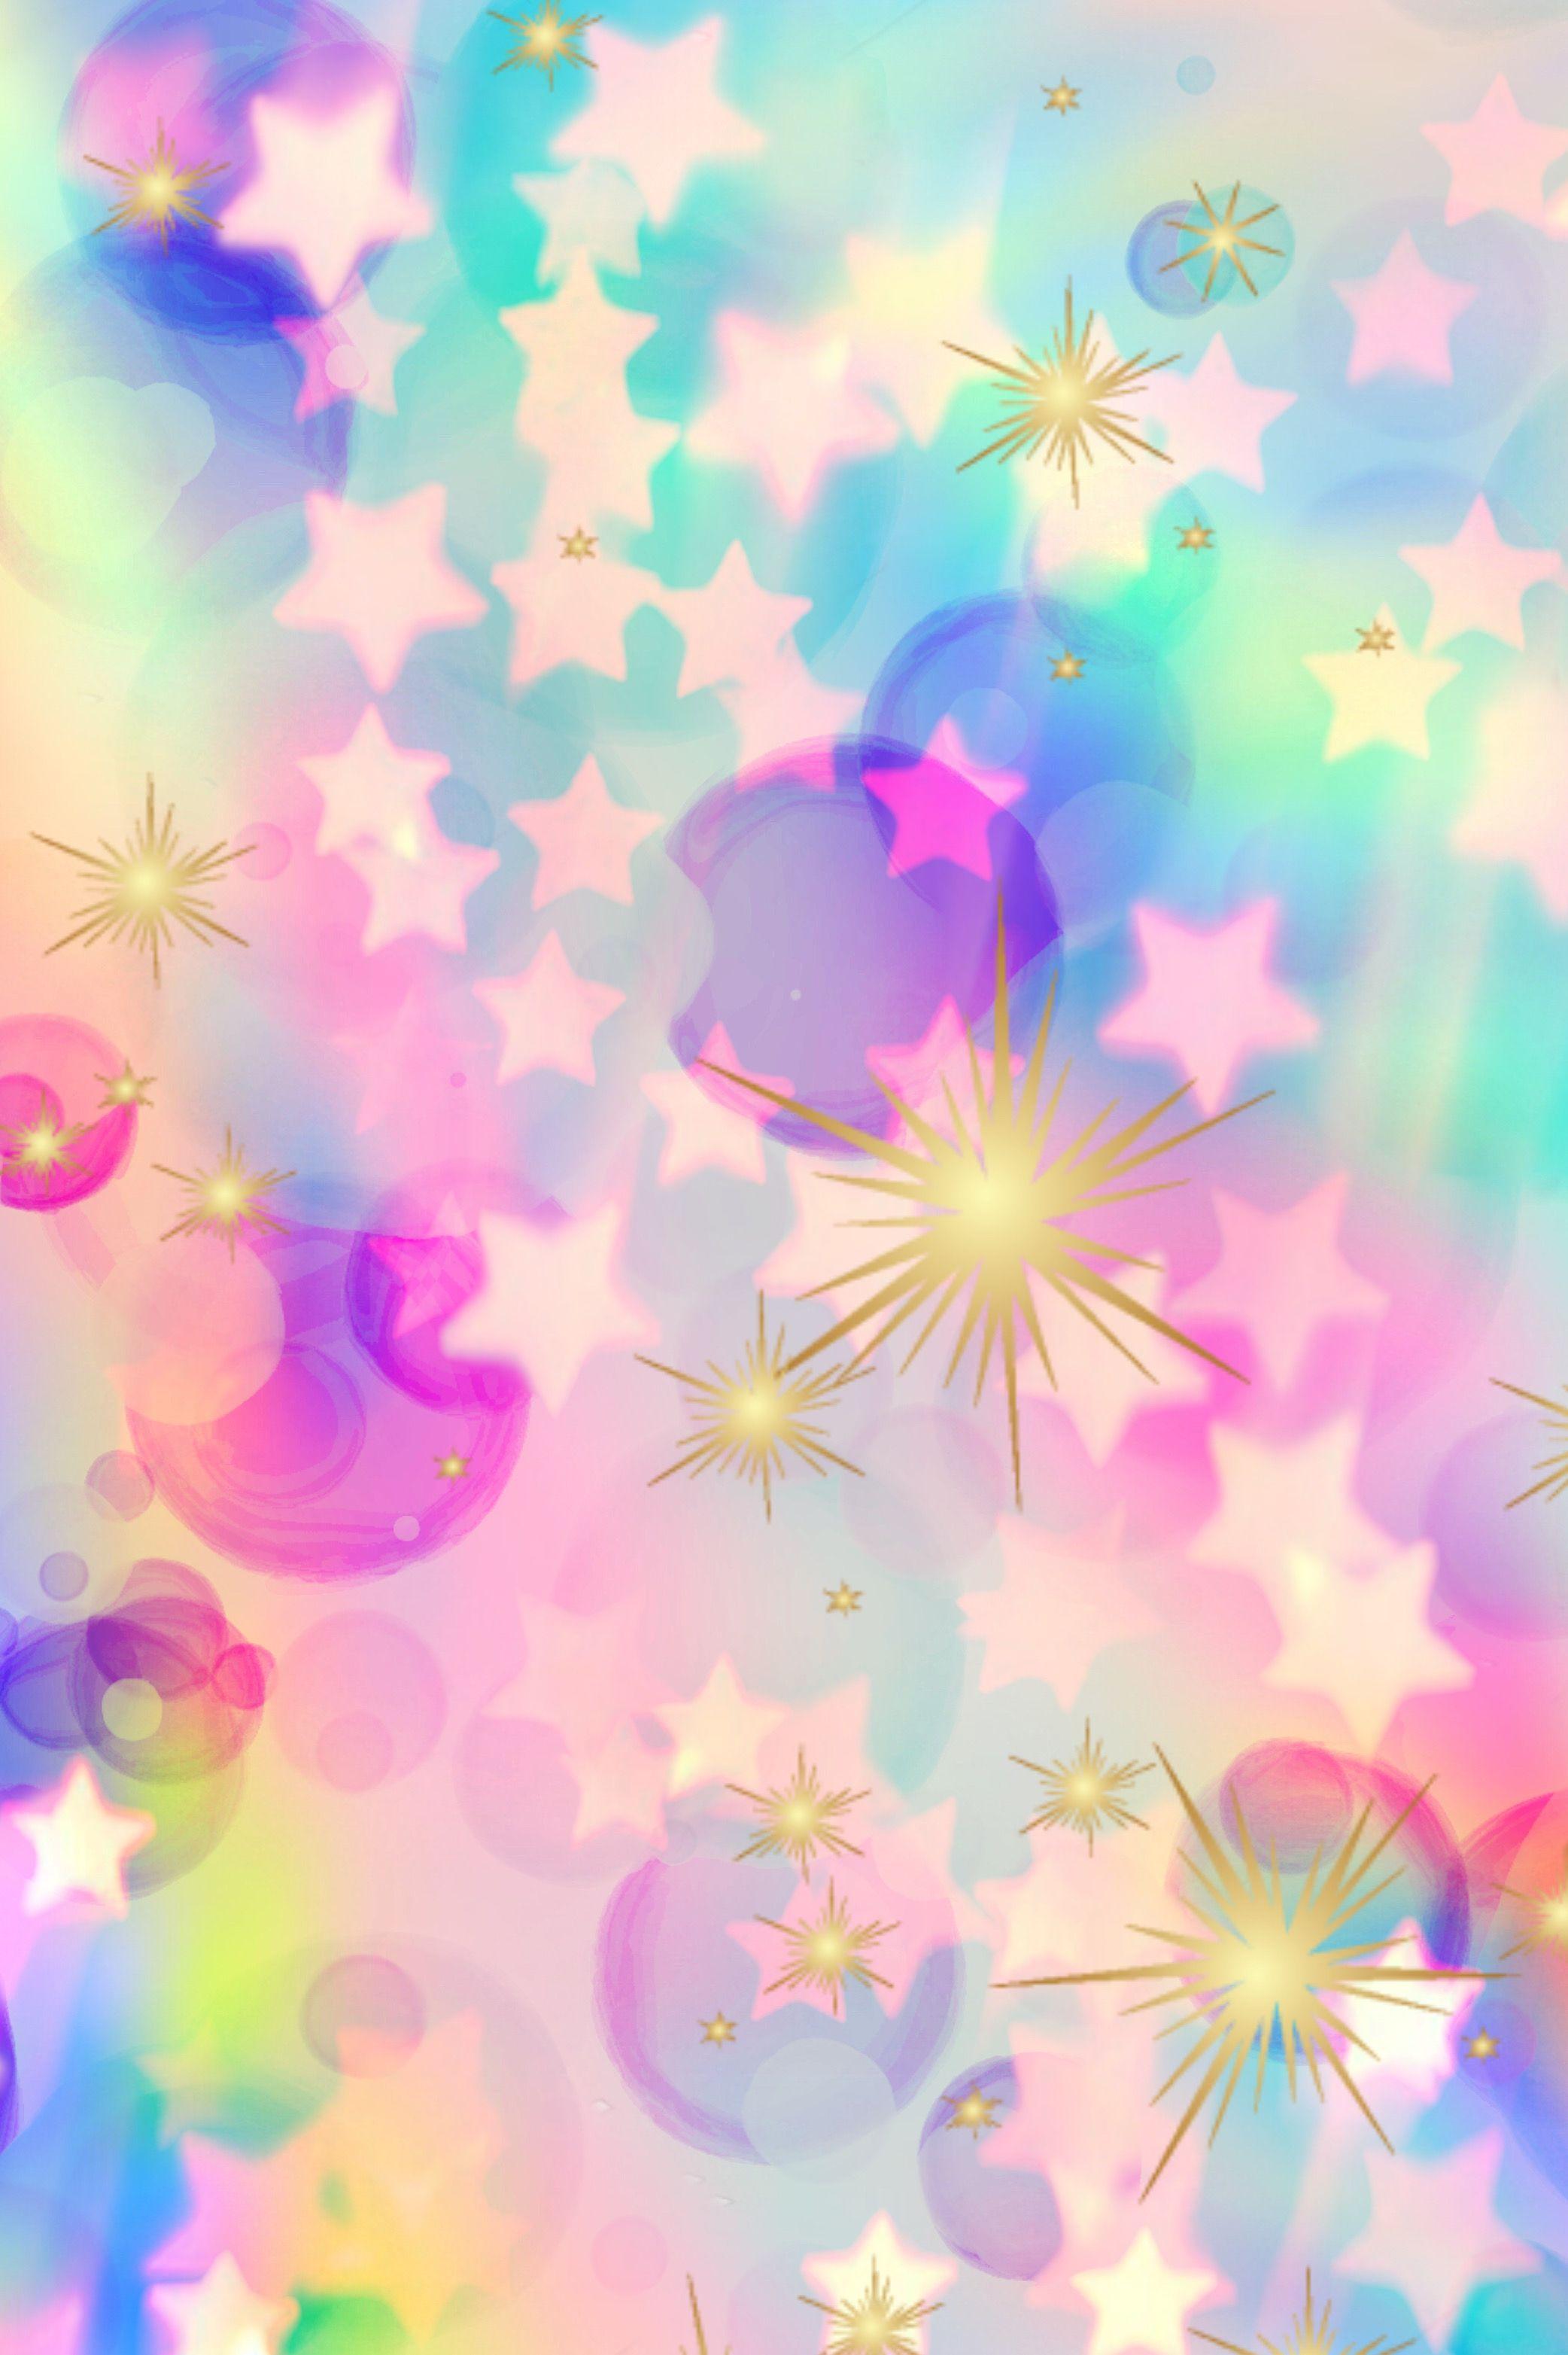 Confetti Explosion Wallpaper Glitter Sparkle Galaxy Stars Bokeh Bubbles Pattern Pastel Colorful Rainbow Cute Art Wallpaper Star Wallpaper Wallpaper